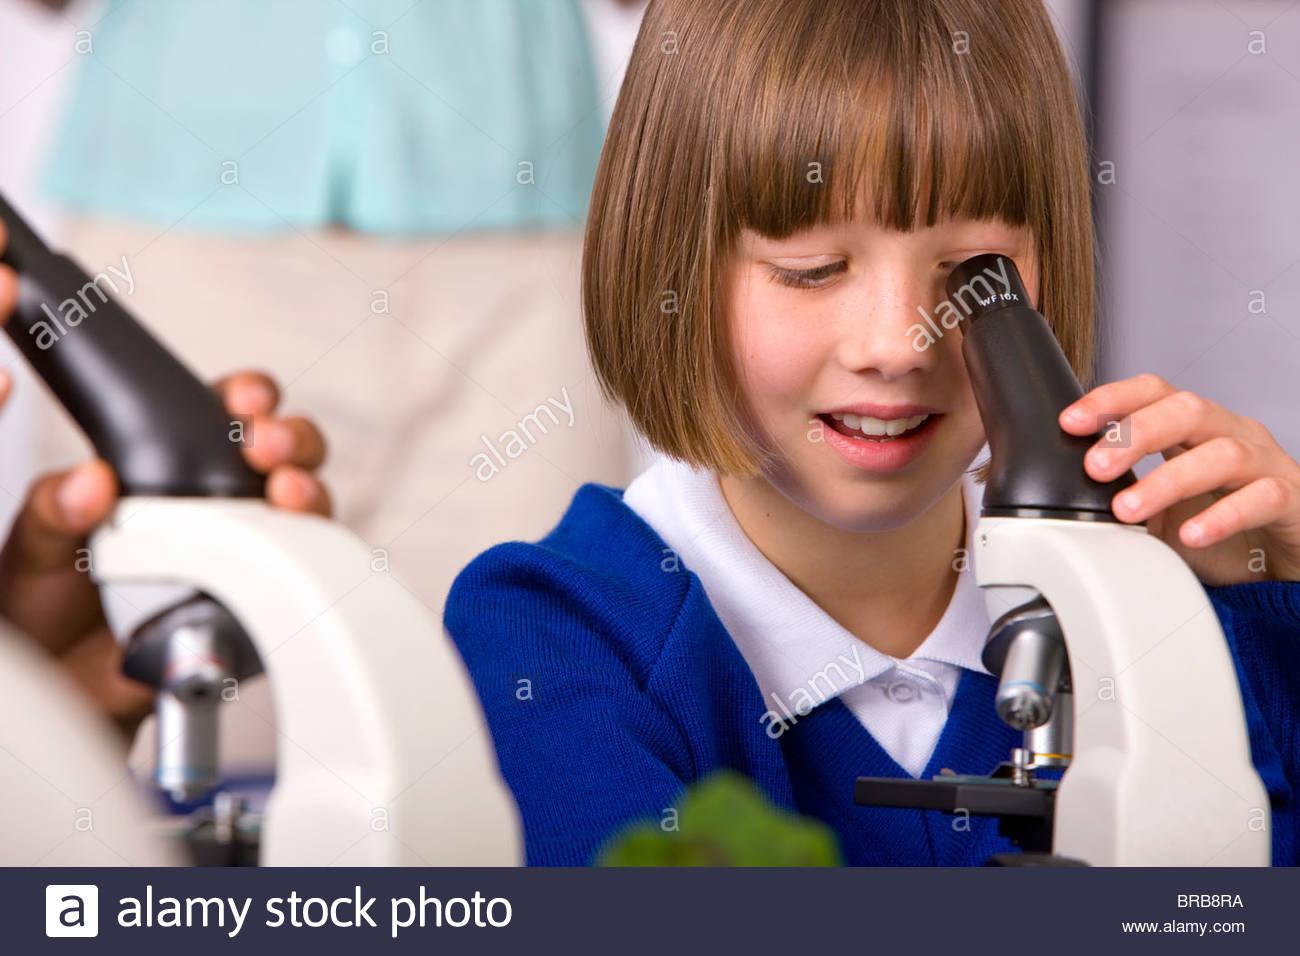 School children looking into microscopes in classroom laboratory - Stock Image